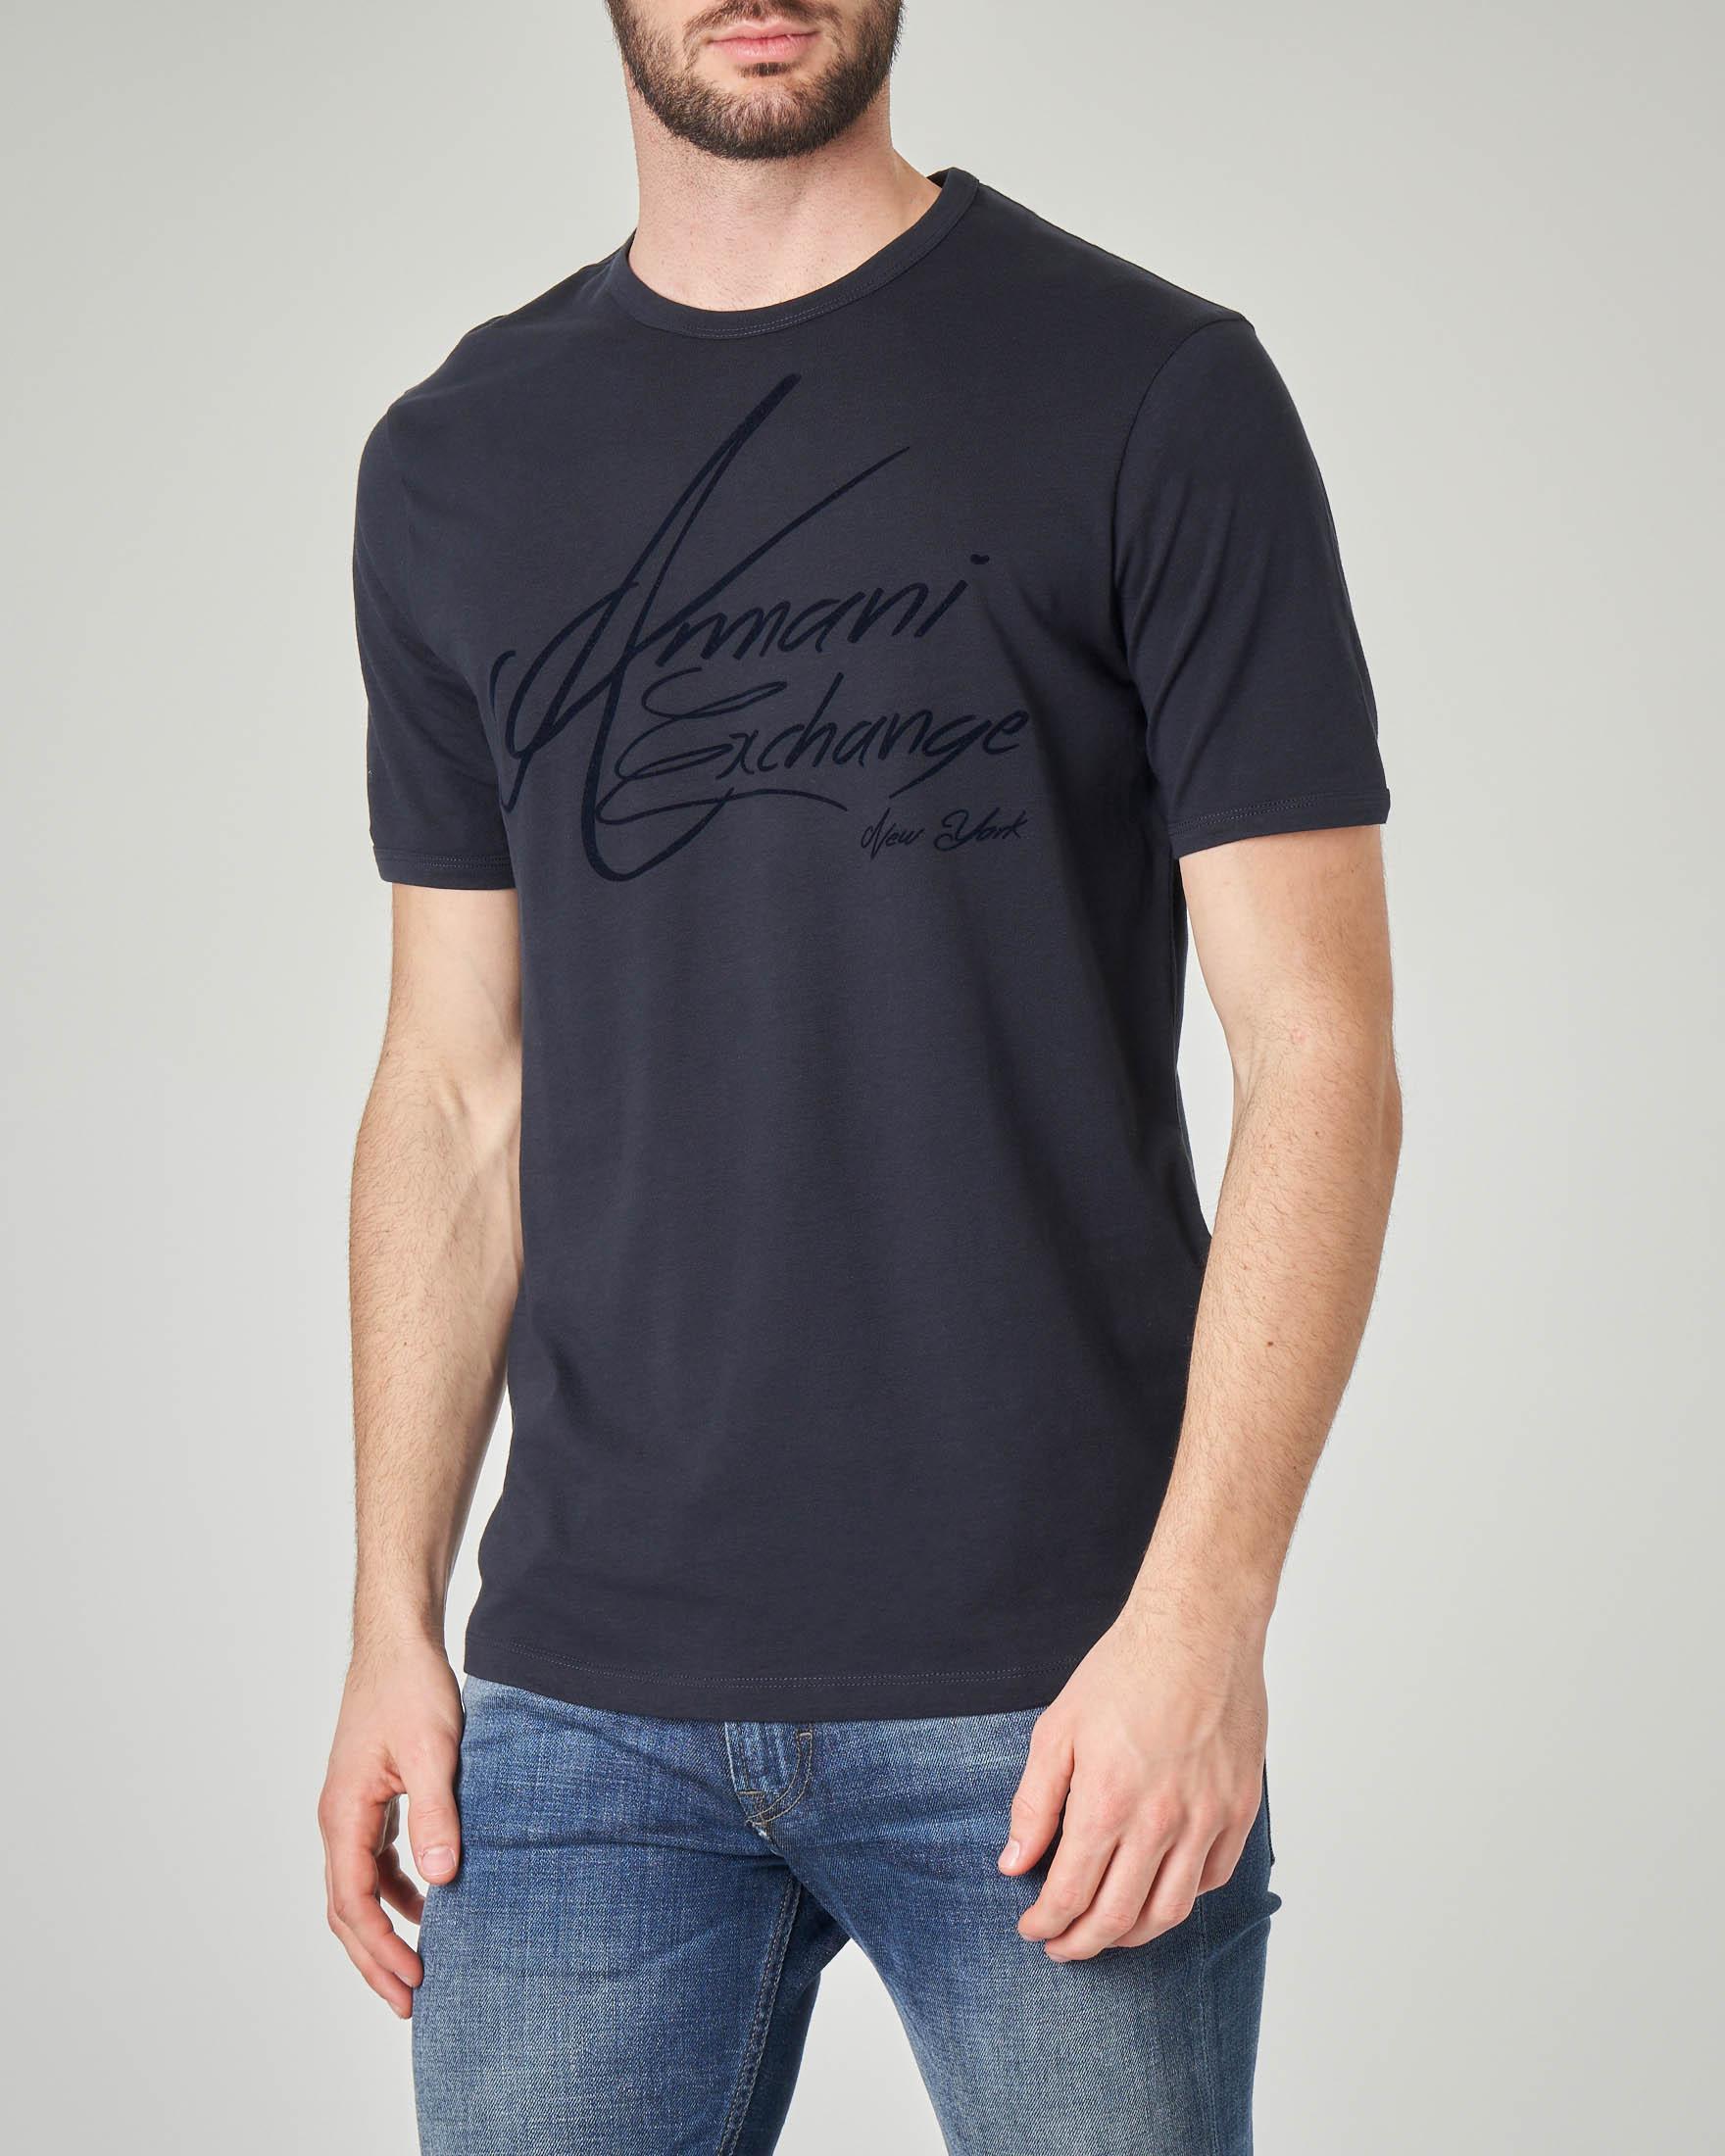 T-shirt blu con logo firmato